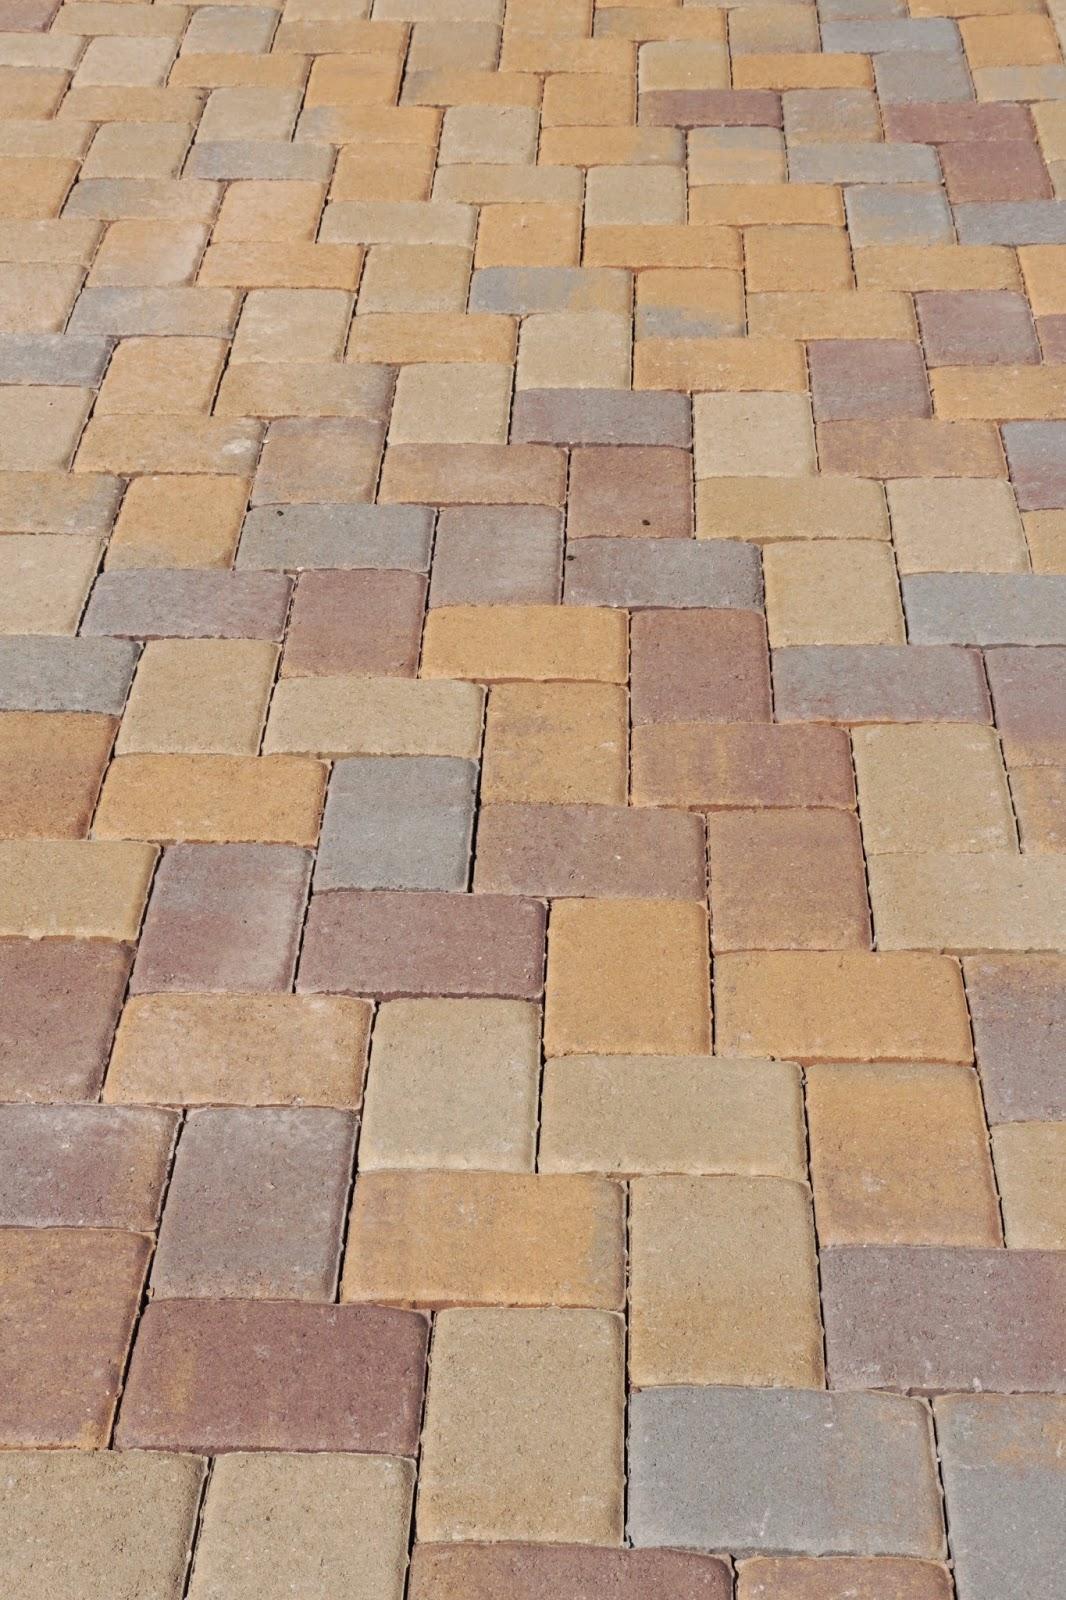 belgard pavers in toscana mohave mix, herringbone paver pattern